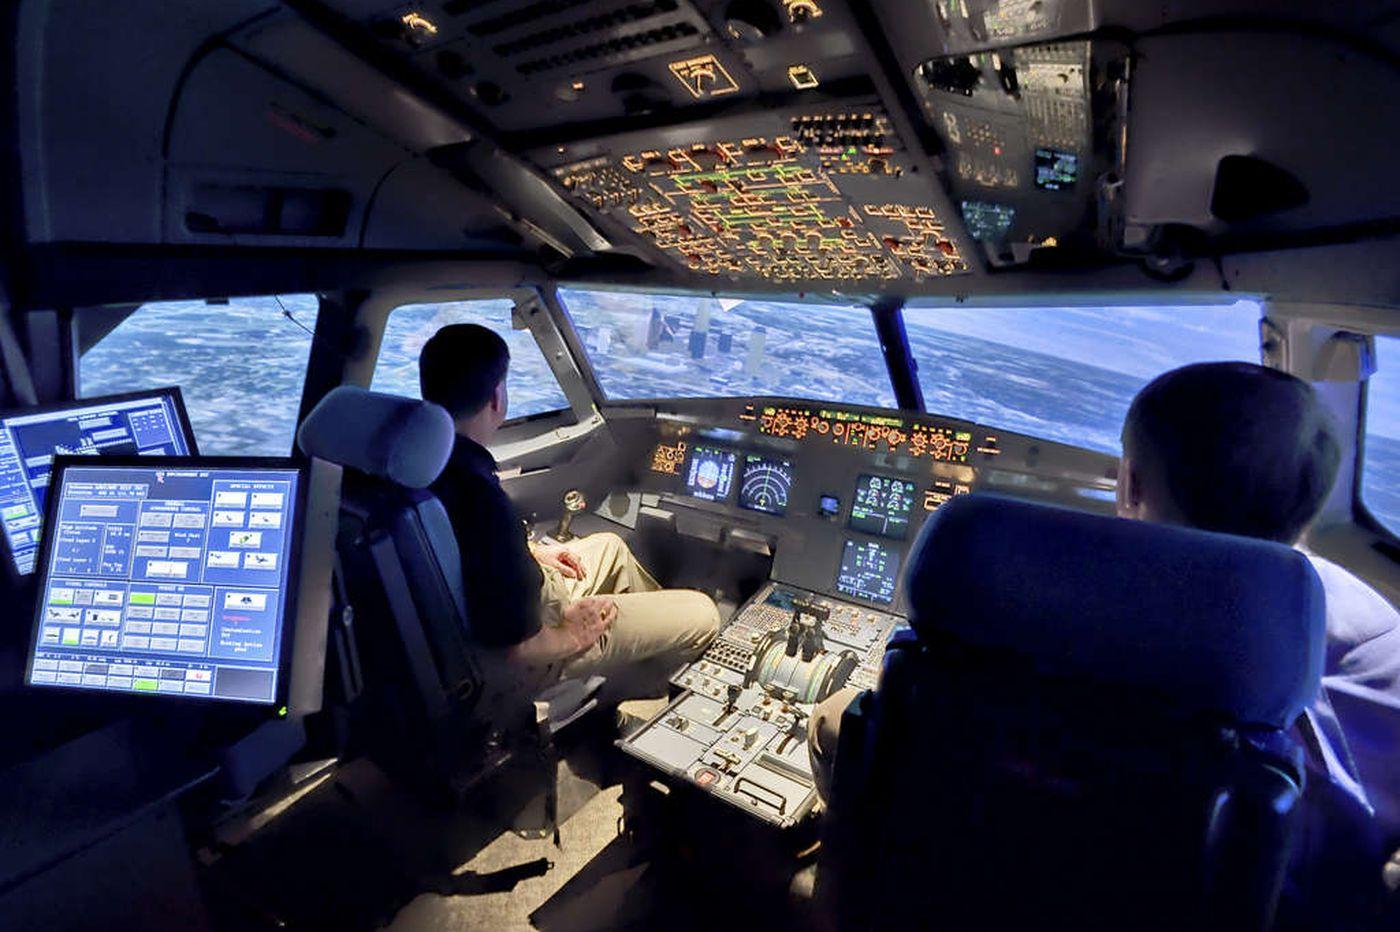 Expert: US rules make chances of cockpit takeover slim